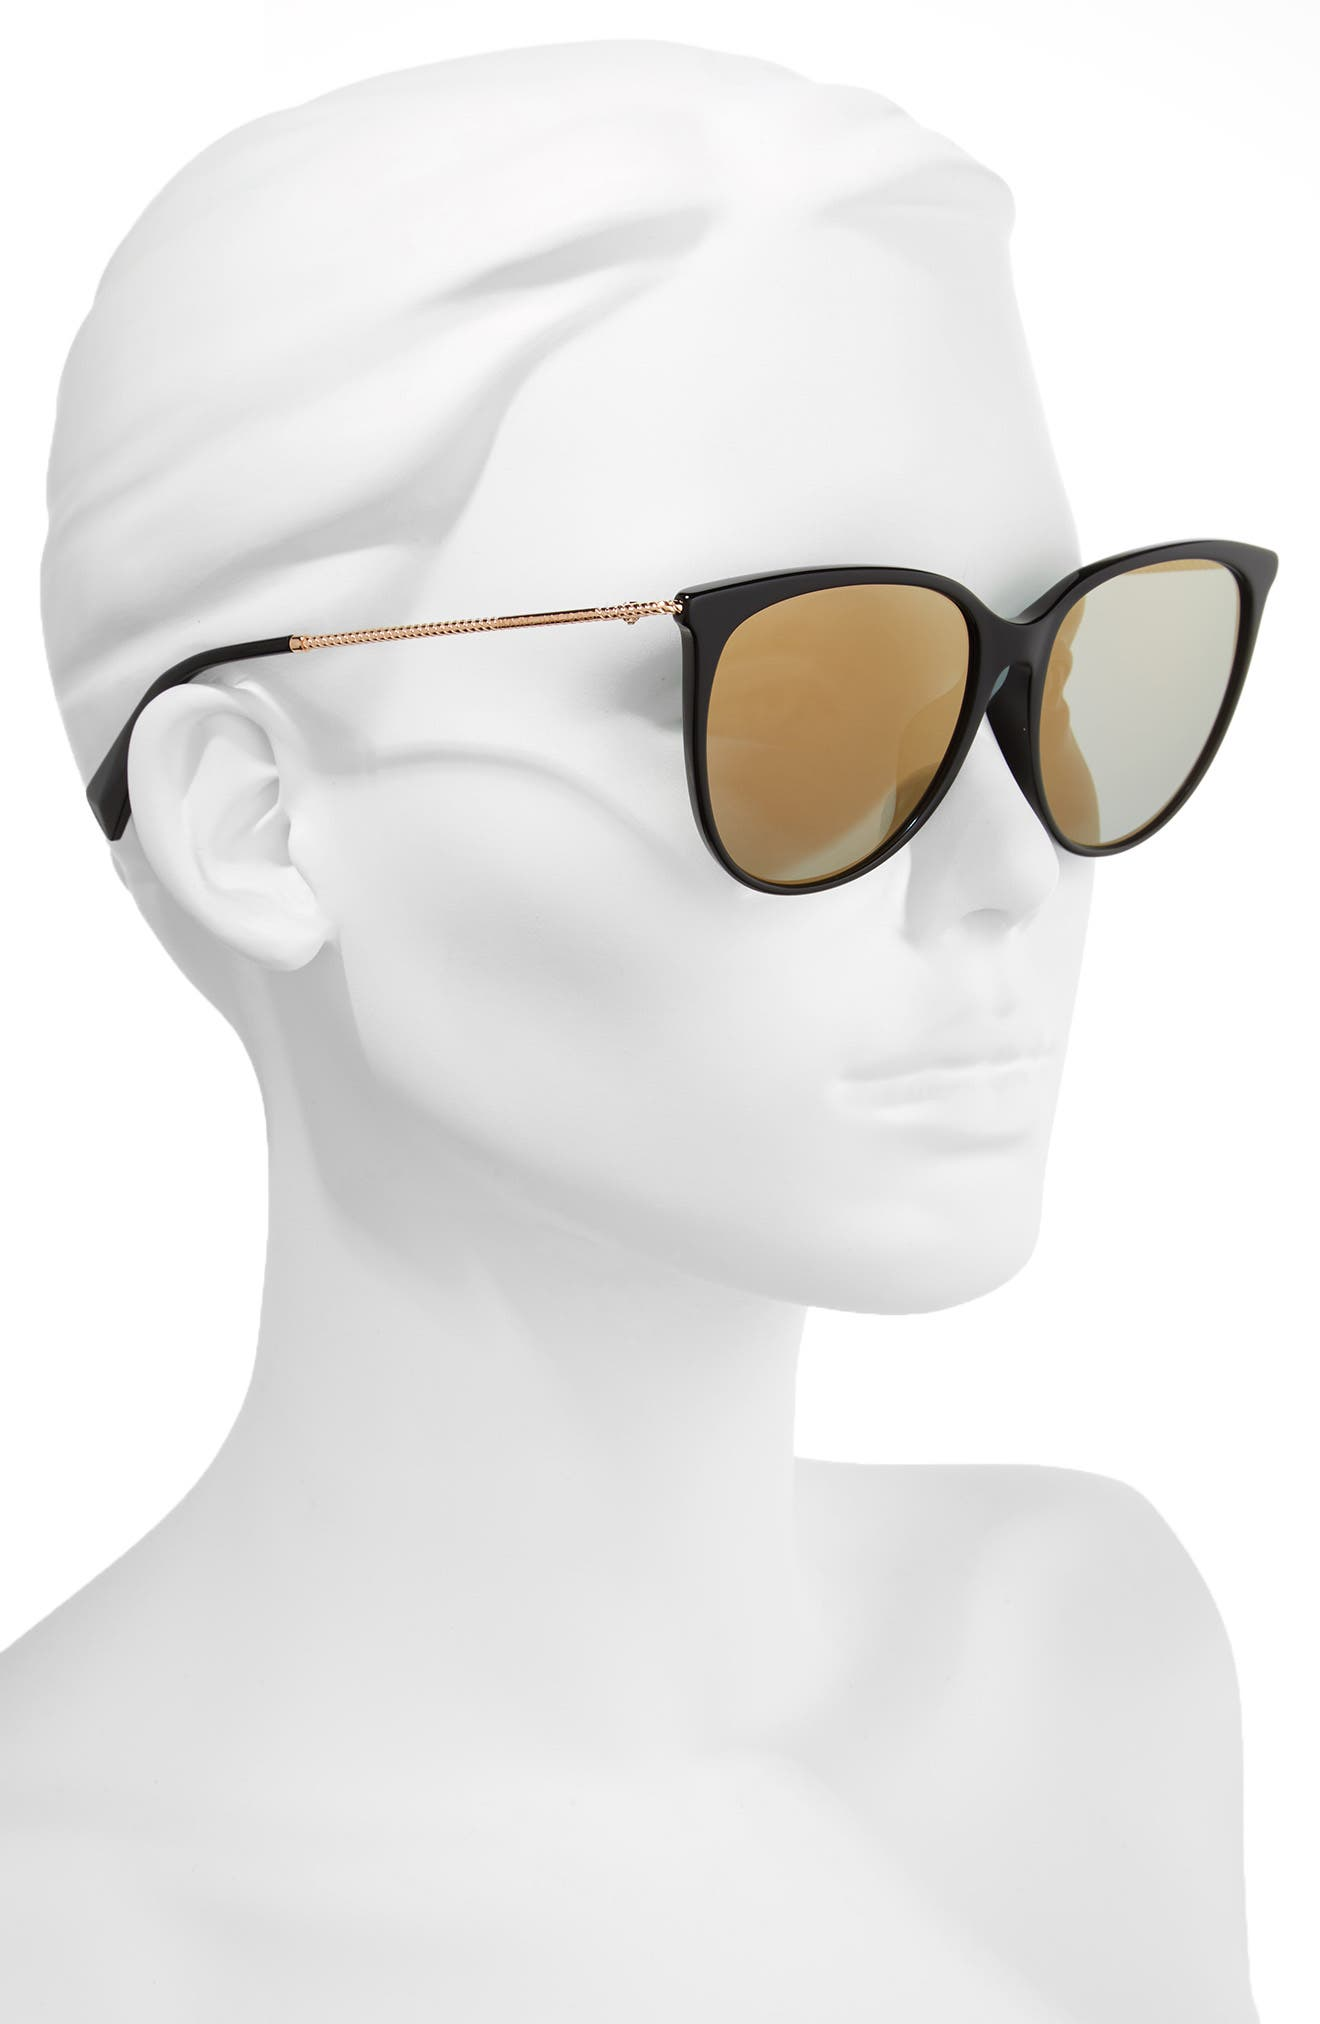 MARC JACOBS,                             56mm Cat Eye Sunglasses,                             Alternate thumbnail 2, color,                             001